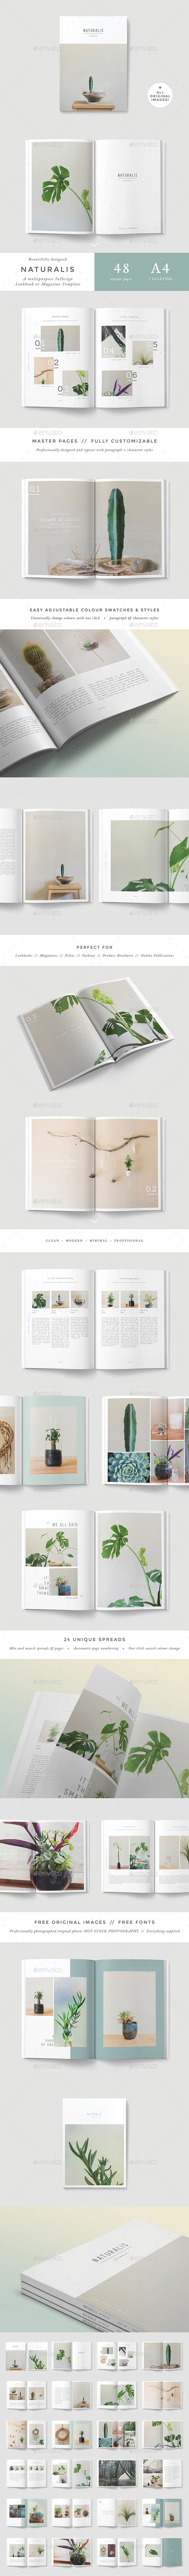 Naturalis Lookbook / Magazine  — InDesign Template #minimalist #magazine design…